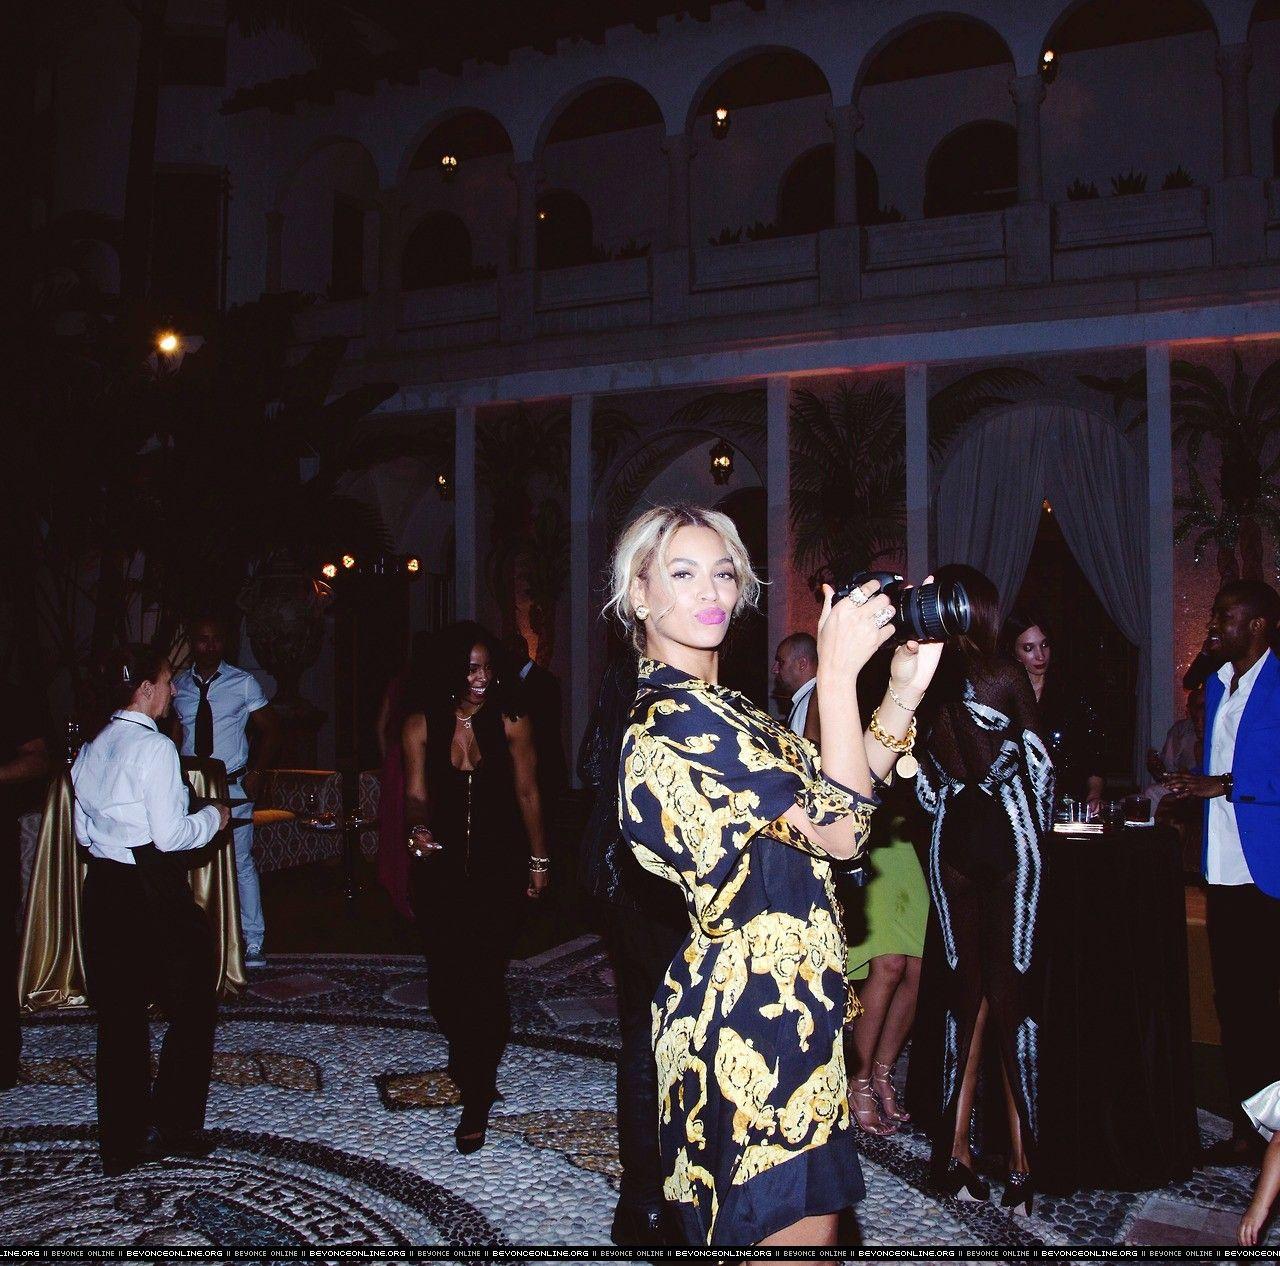 My Life Beyoncé Online Photo Gallery in 2020 Beyonce